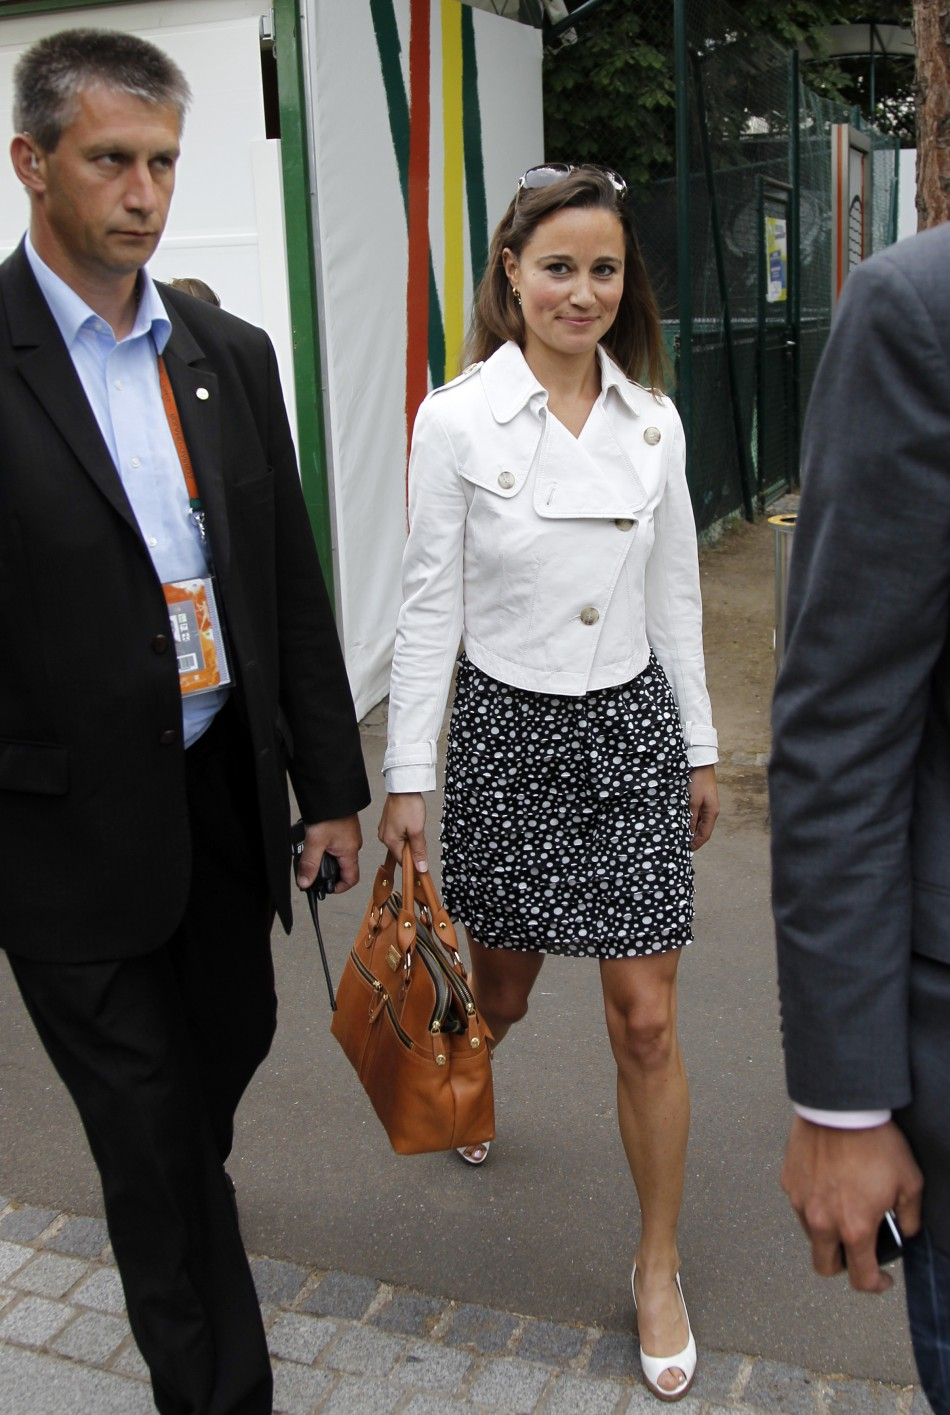 Pippa Middleton wows at yet another glamorous wedding